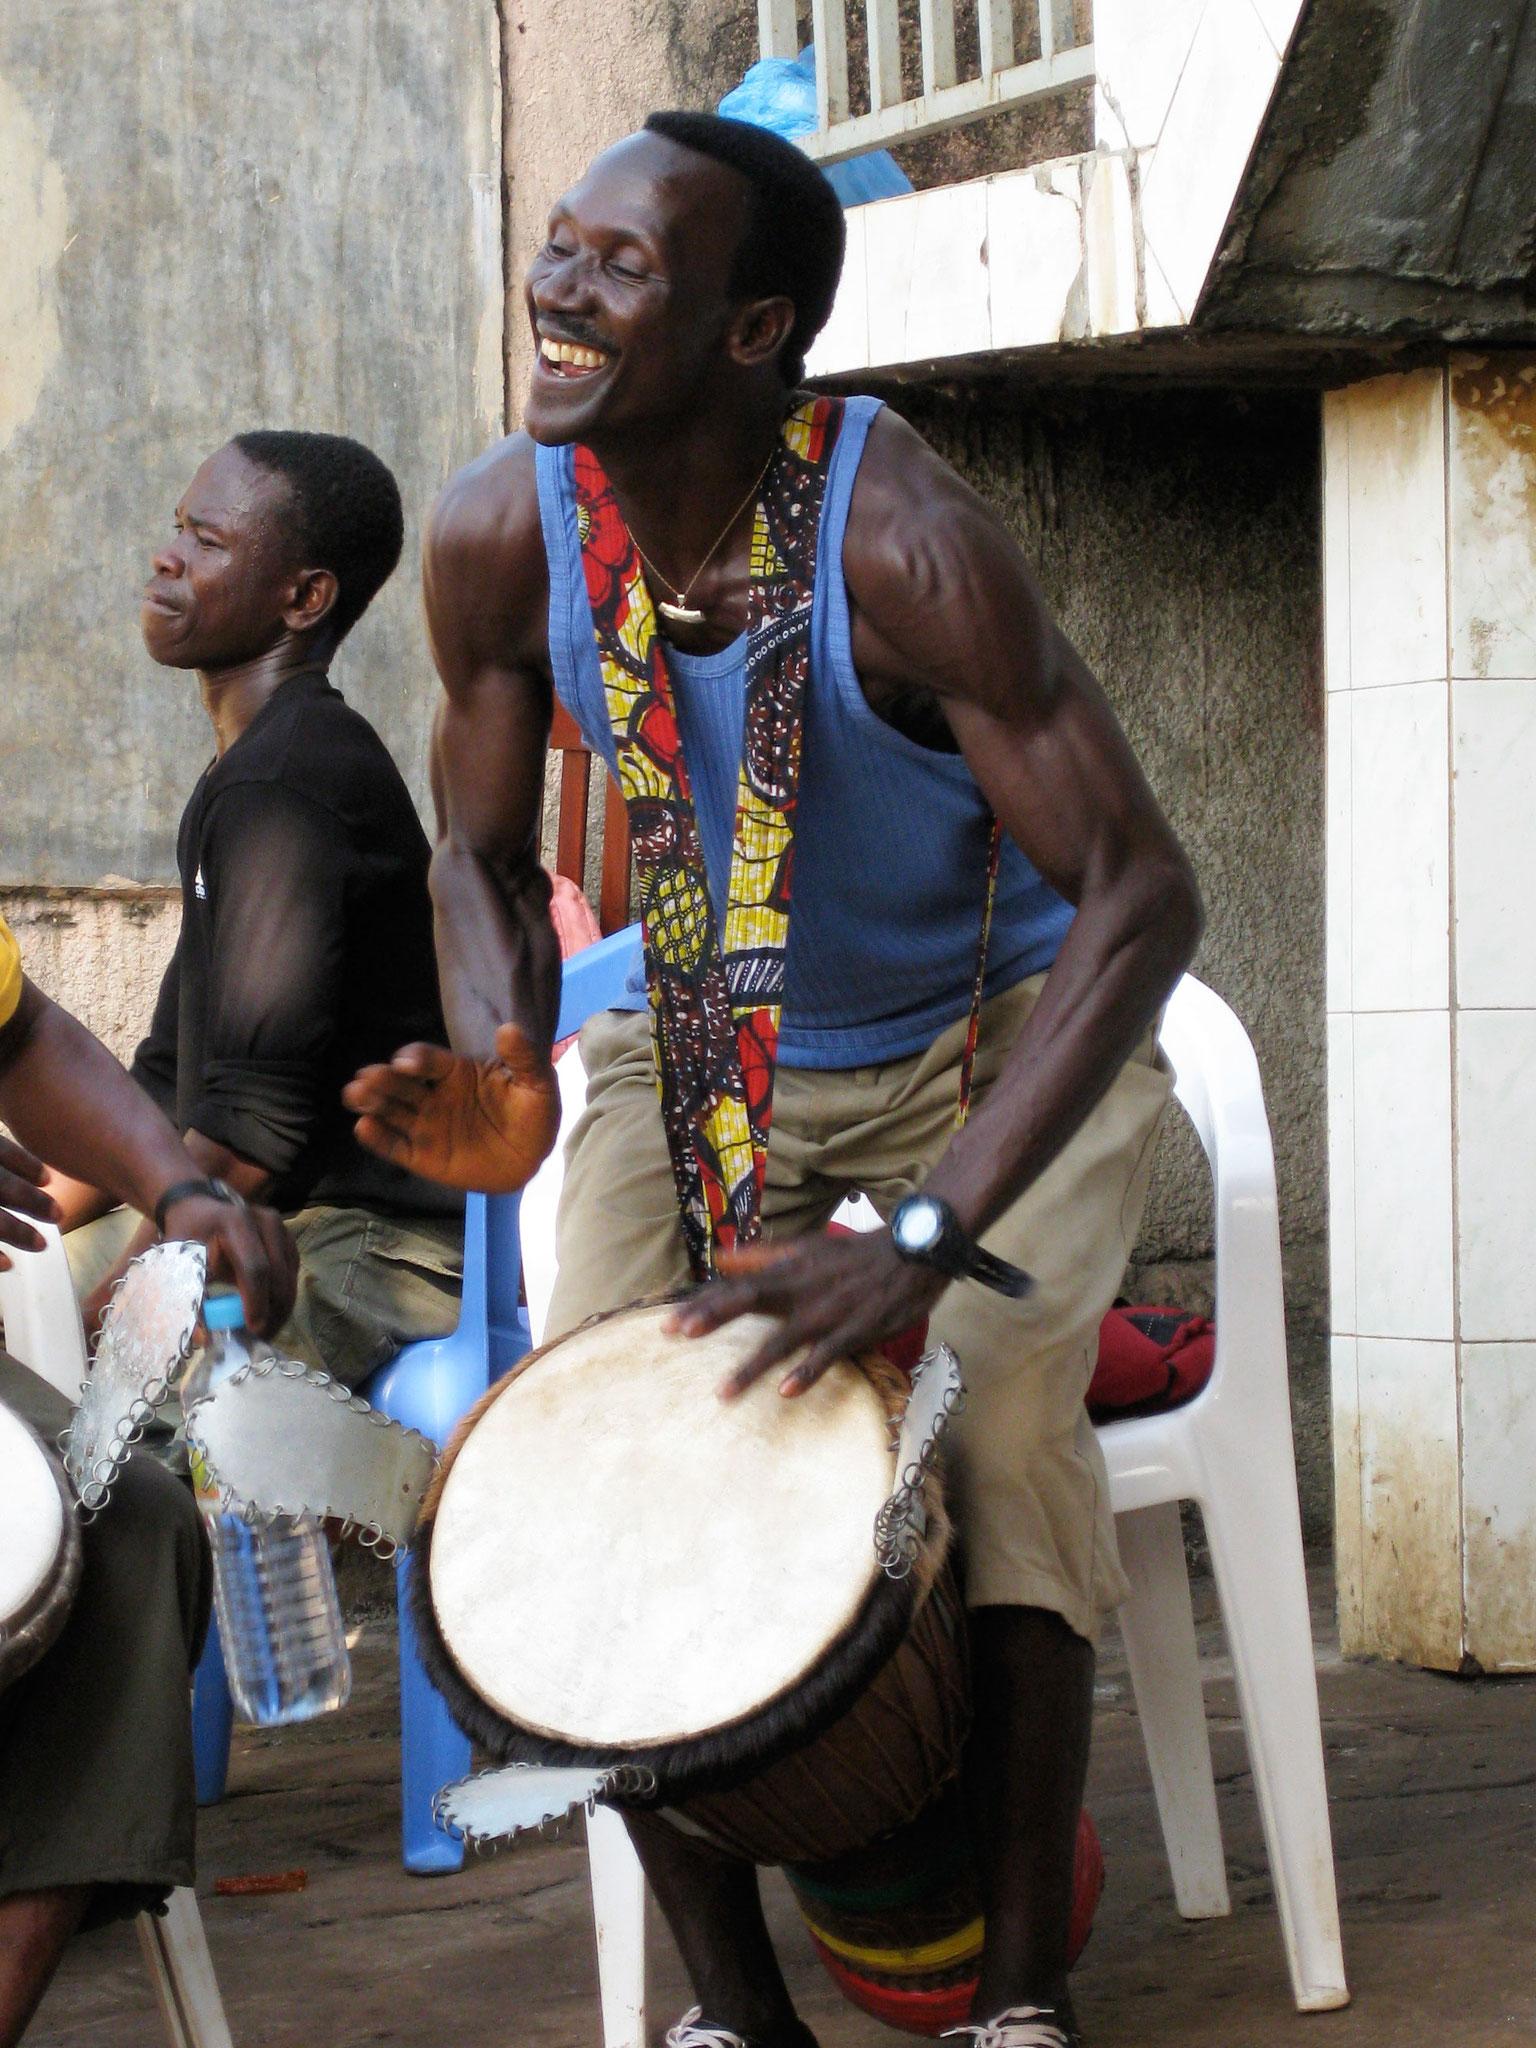 Sayon in Guinea